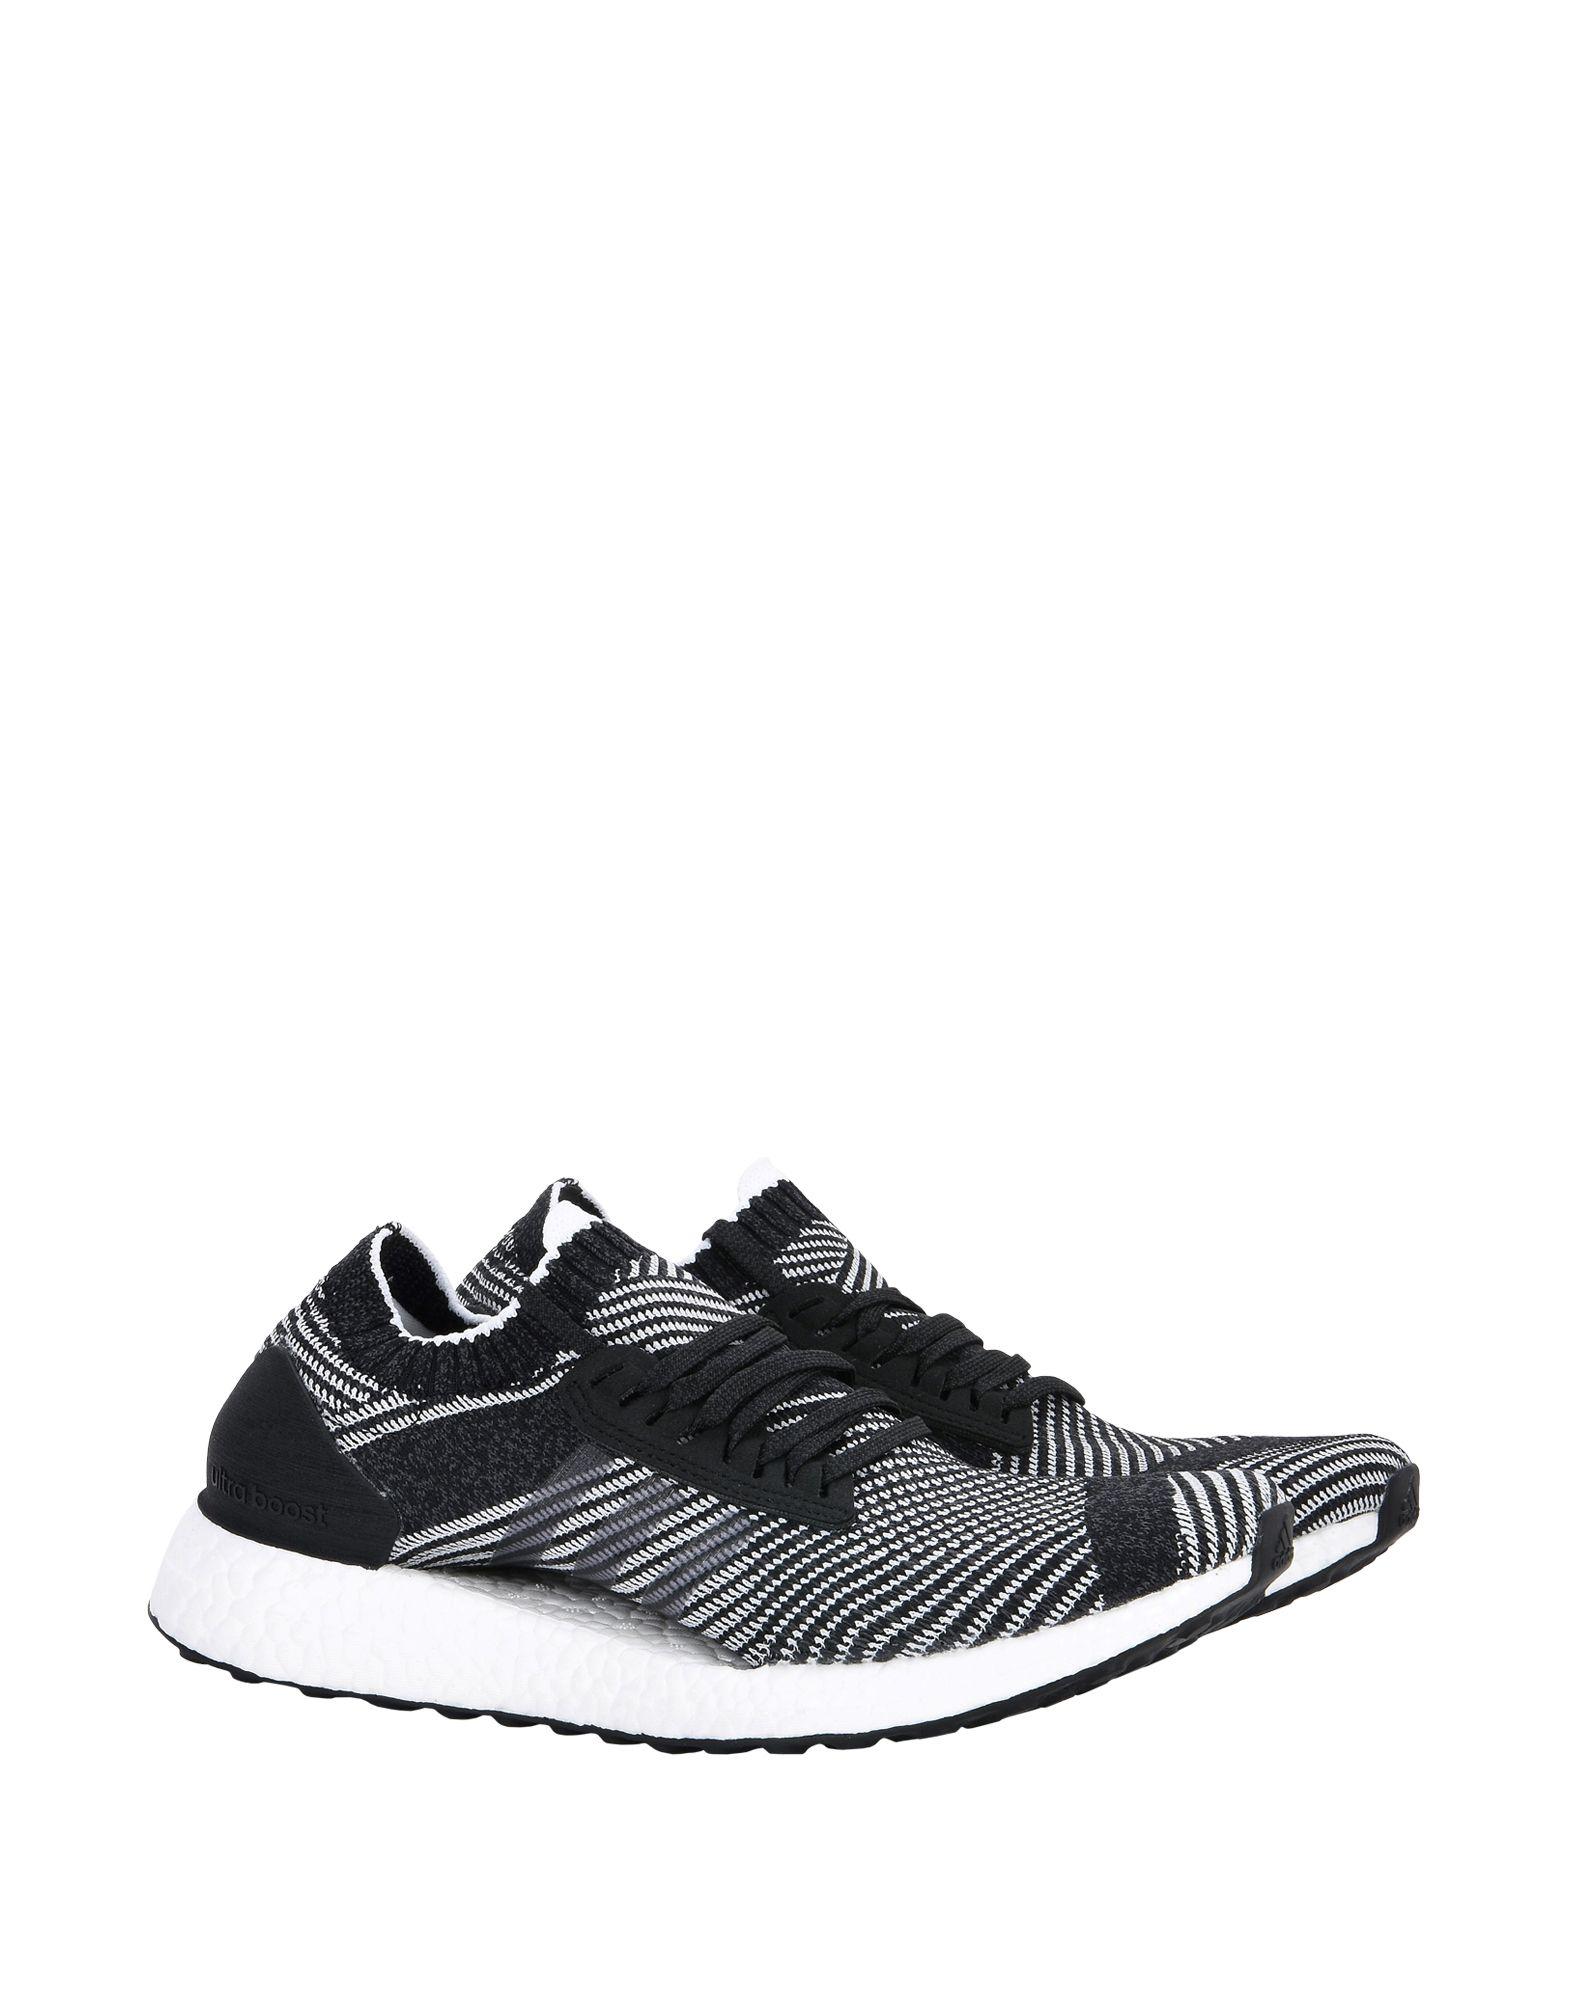 Sneakers Adidas Ultraboost X - Femme - Sneakers Adidas sur ...